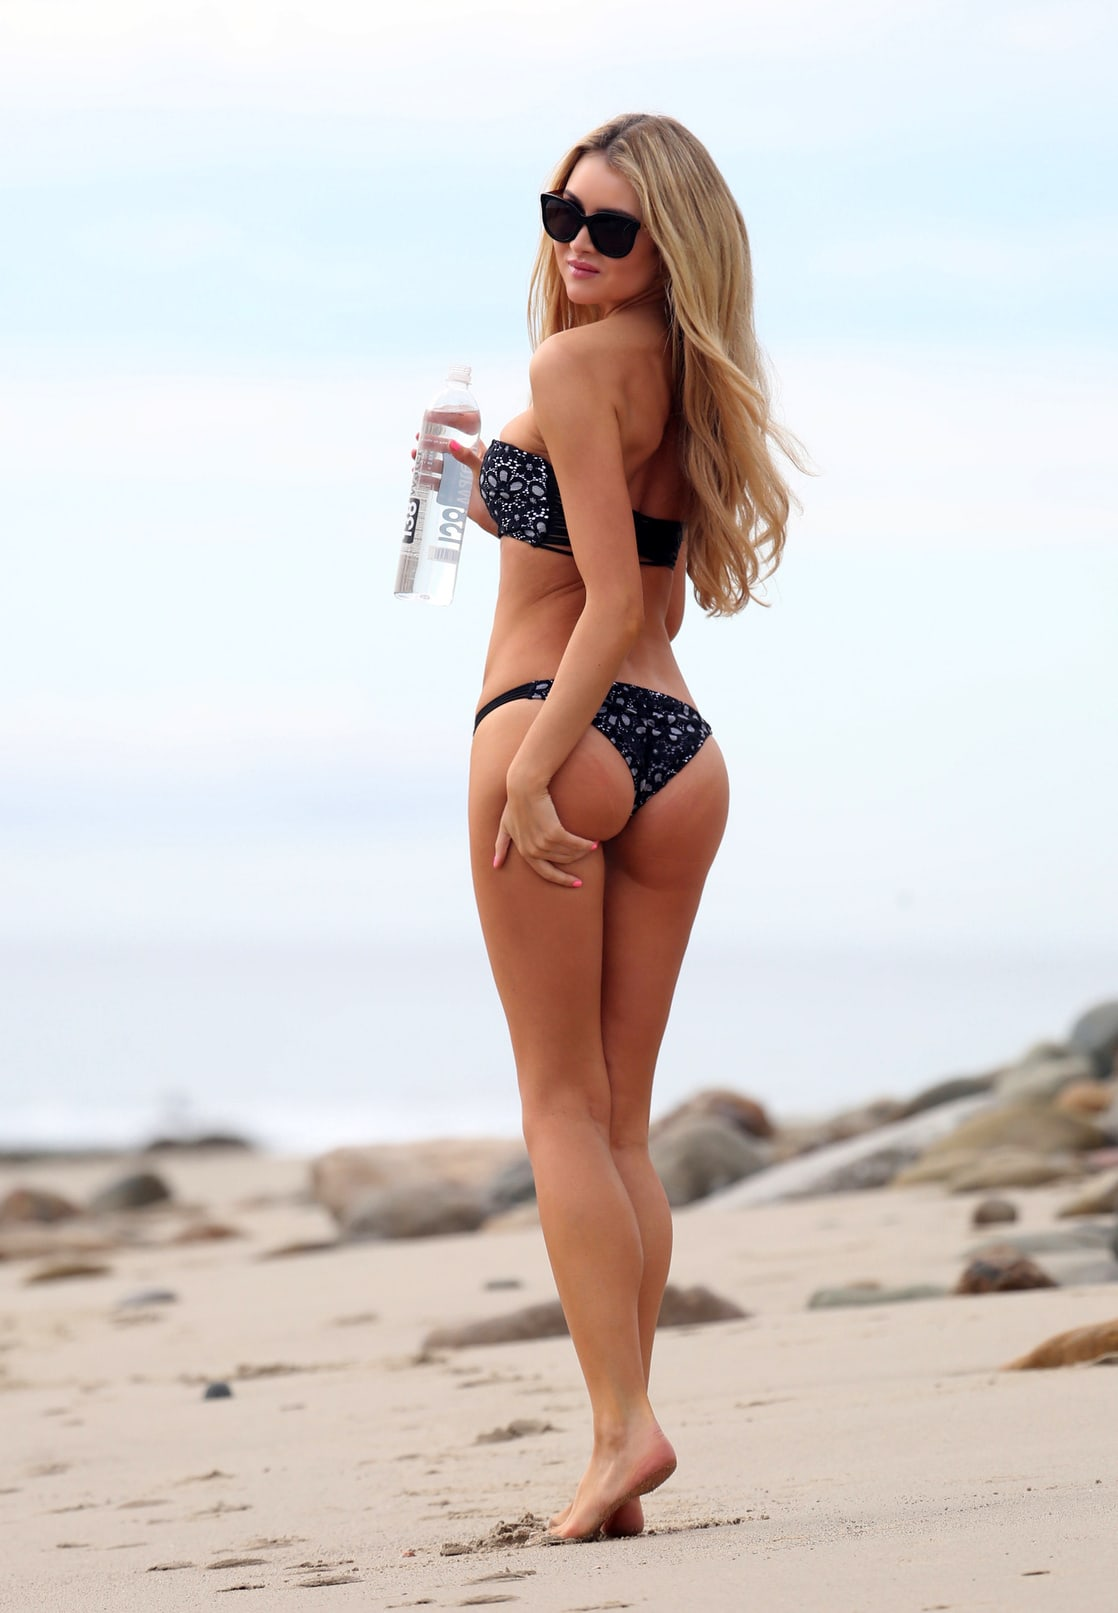 Kerrie McMahon Nude Photos 33